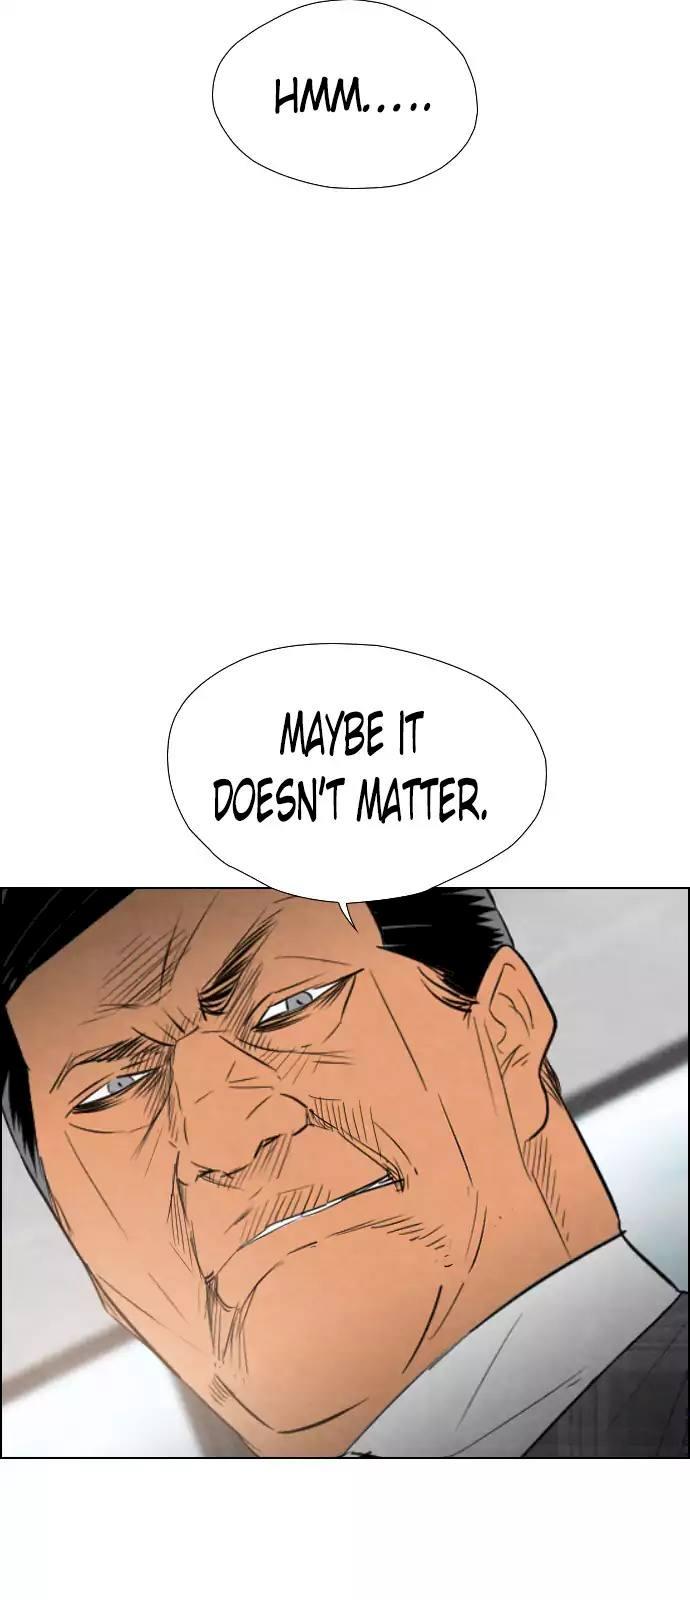 Revival Man - chapter 37-eng-li